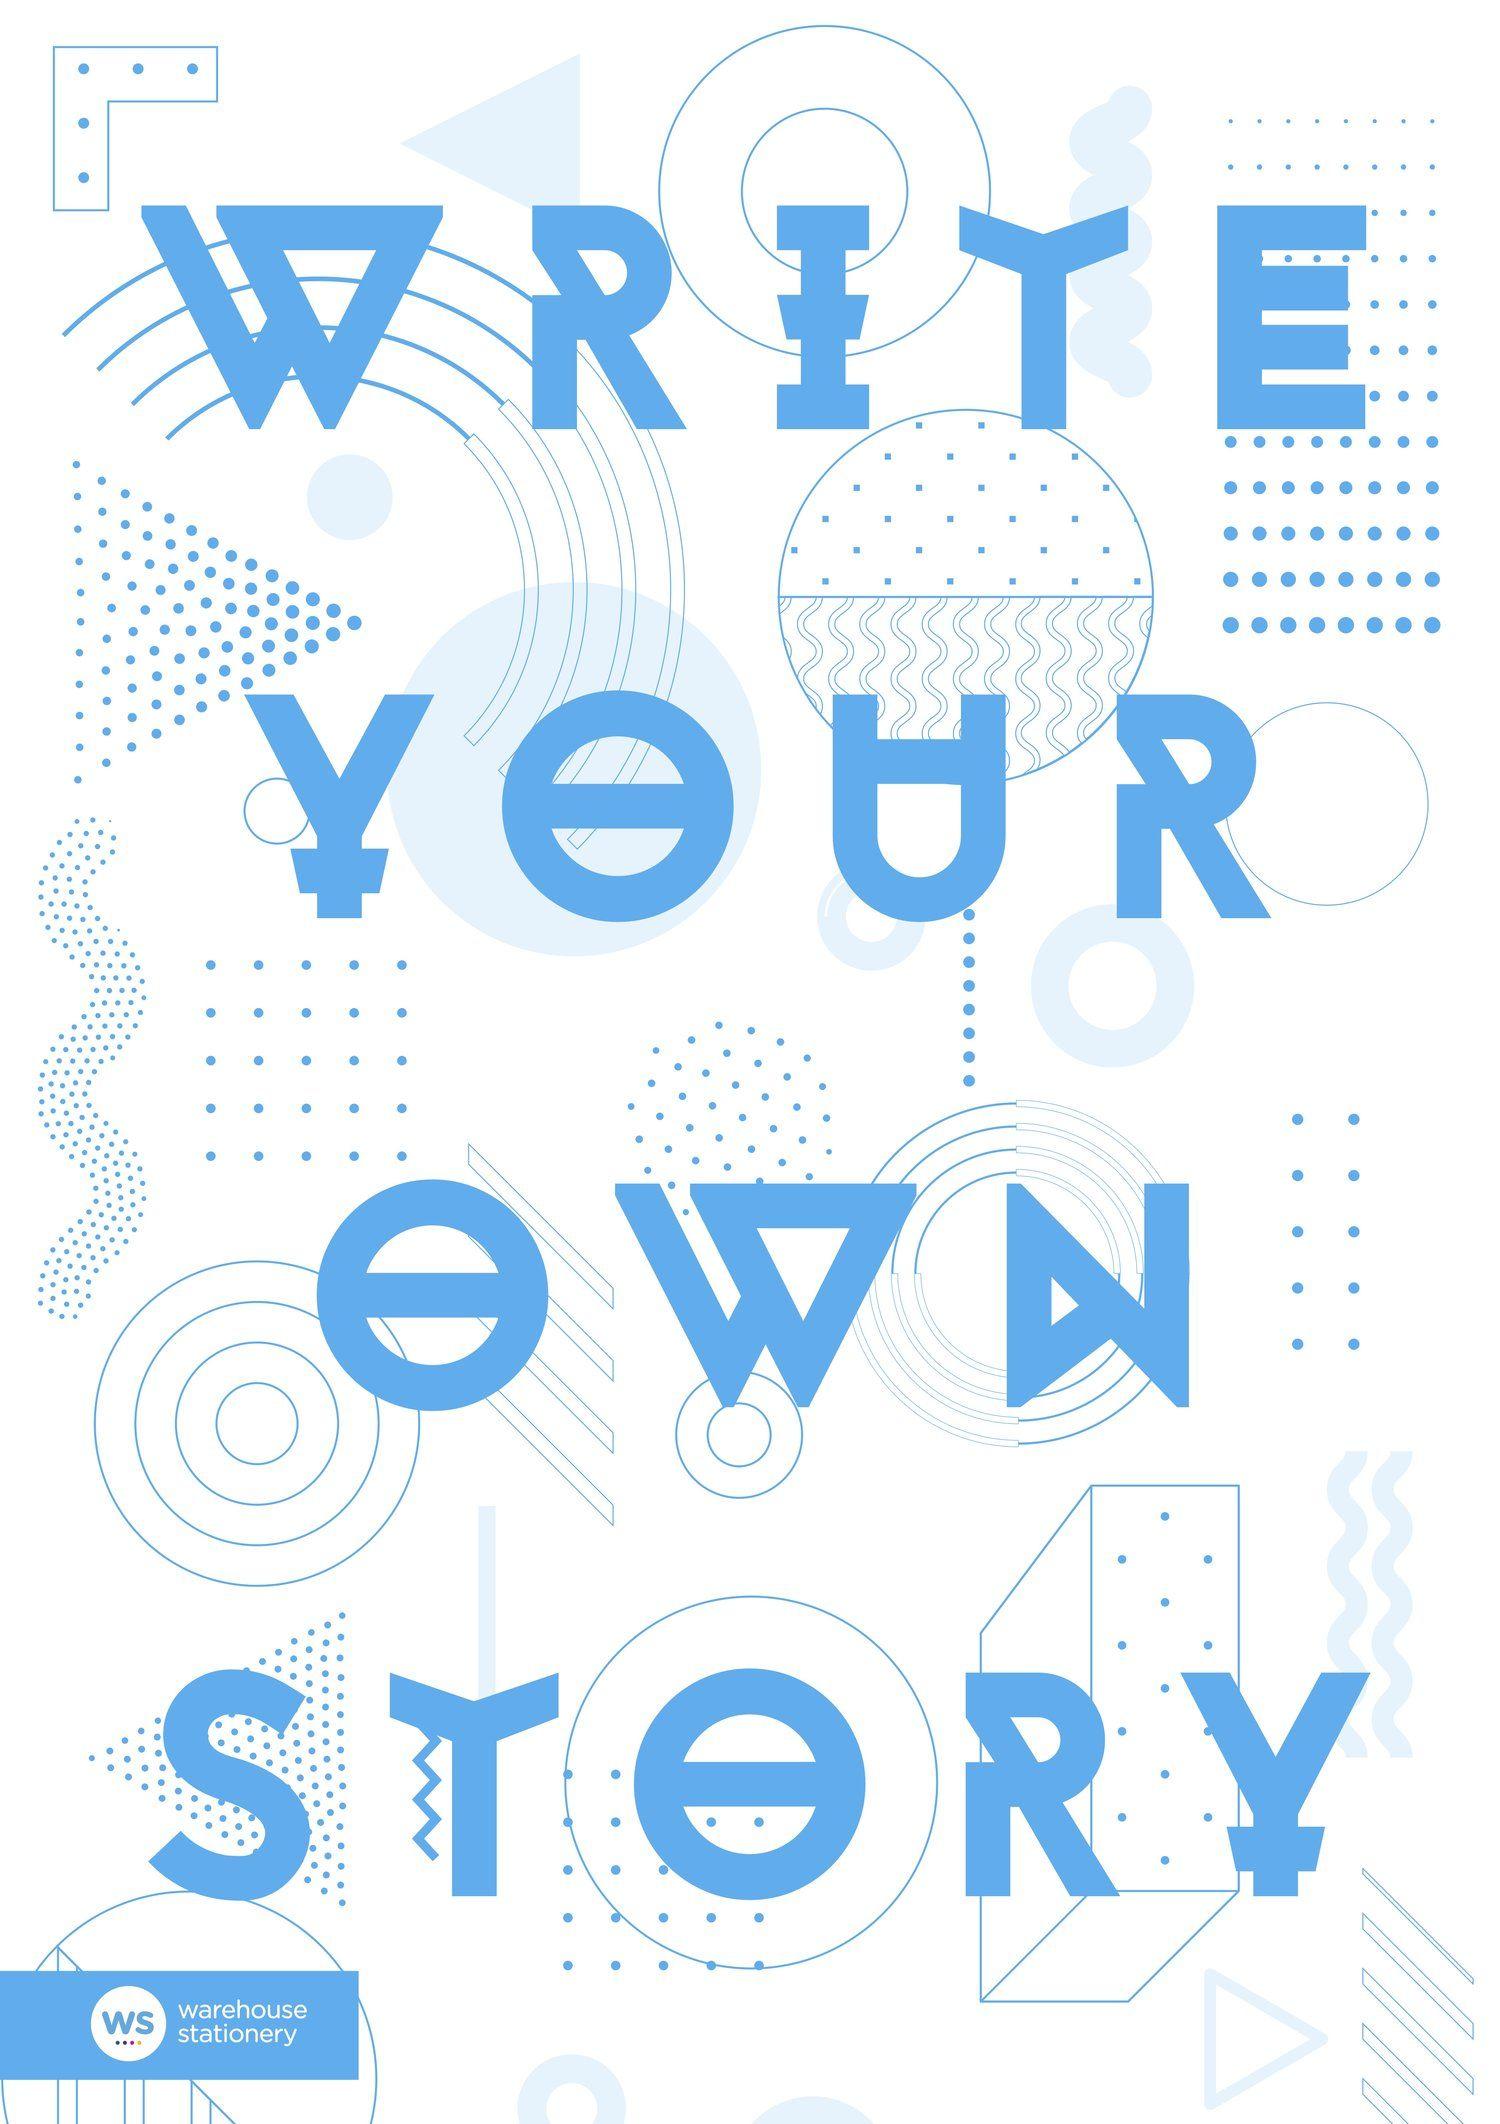 Get New Zealand Writing